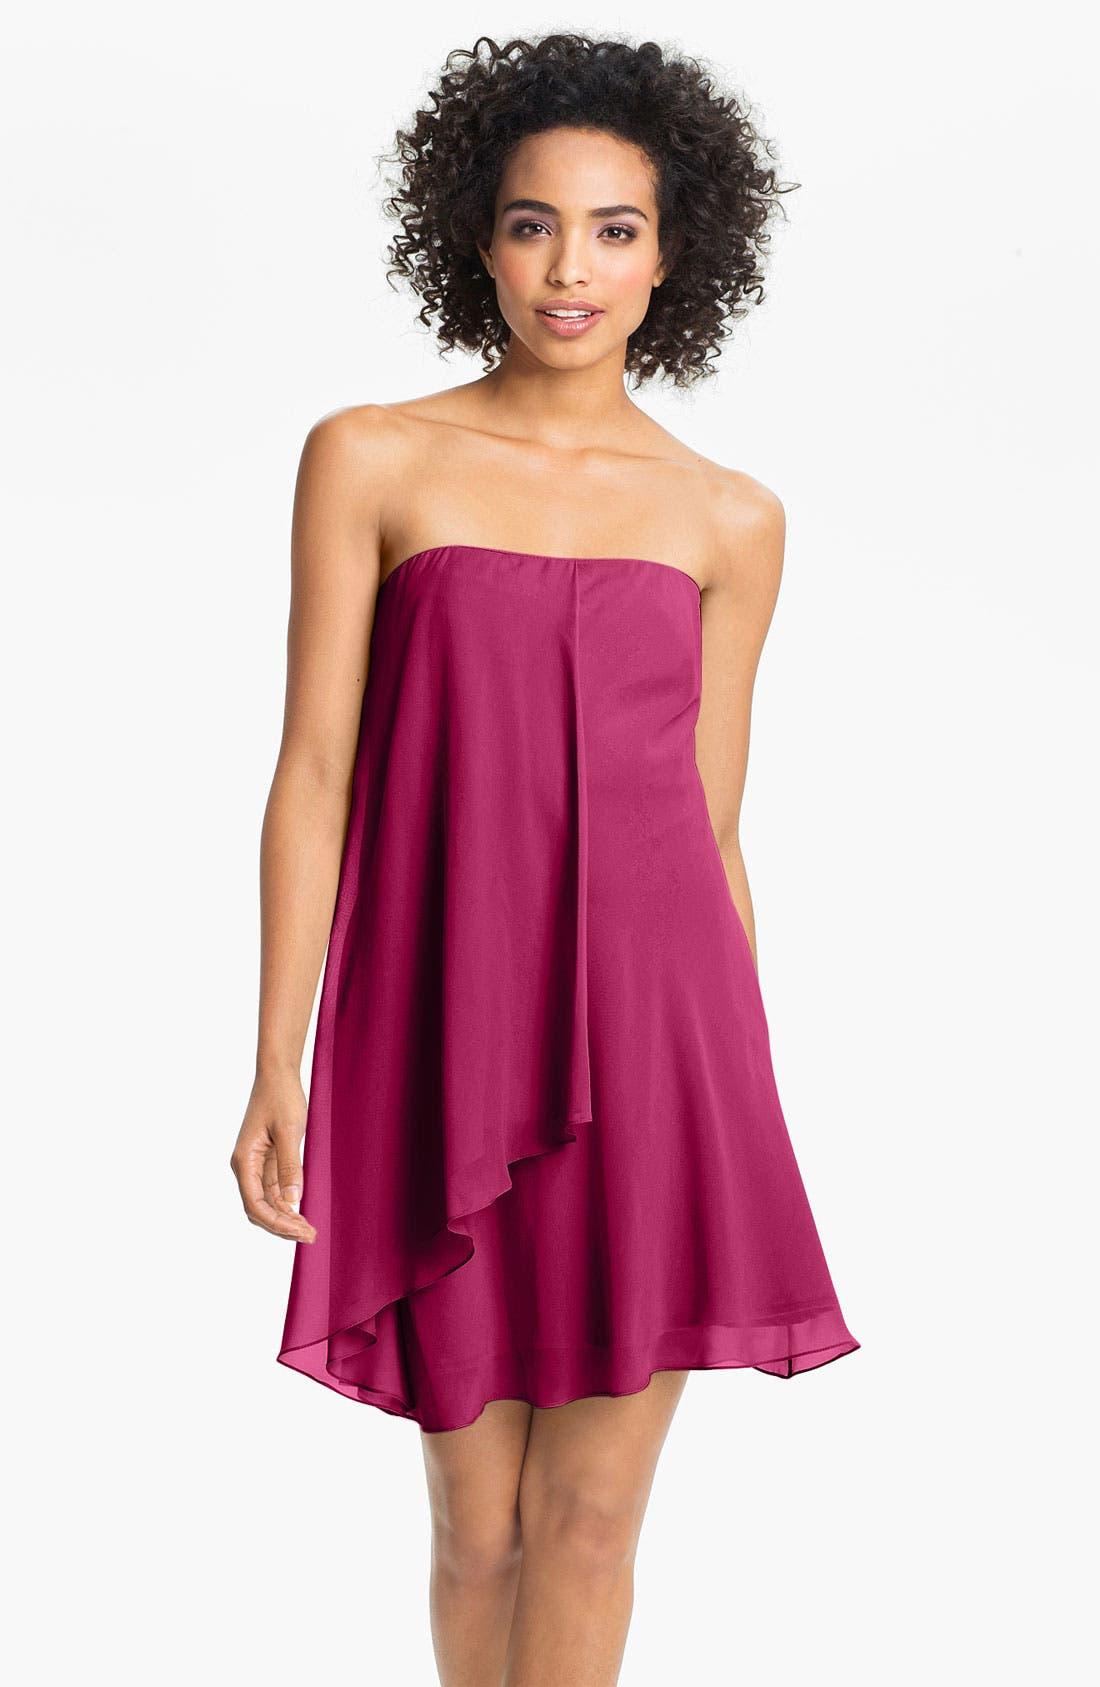 Alternate Image 1 Selected - Suzi Chin for Maggy Boutique Silk Chiffon Dress